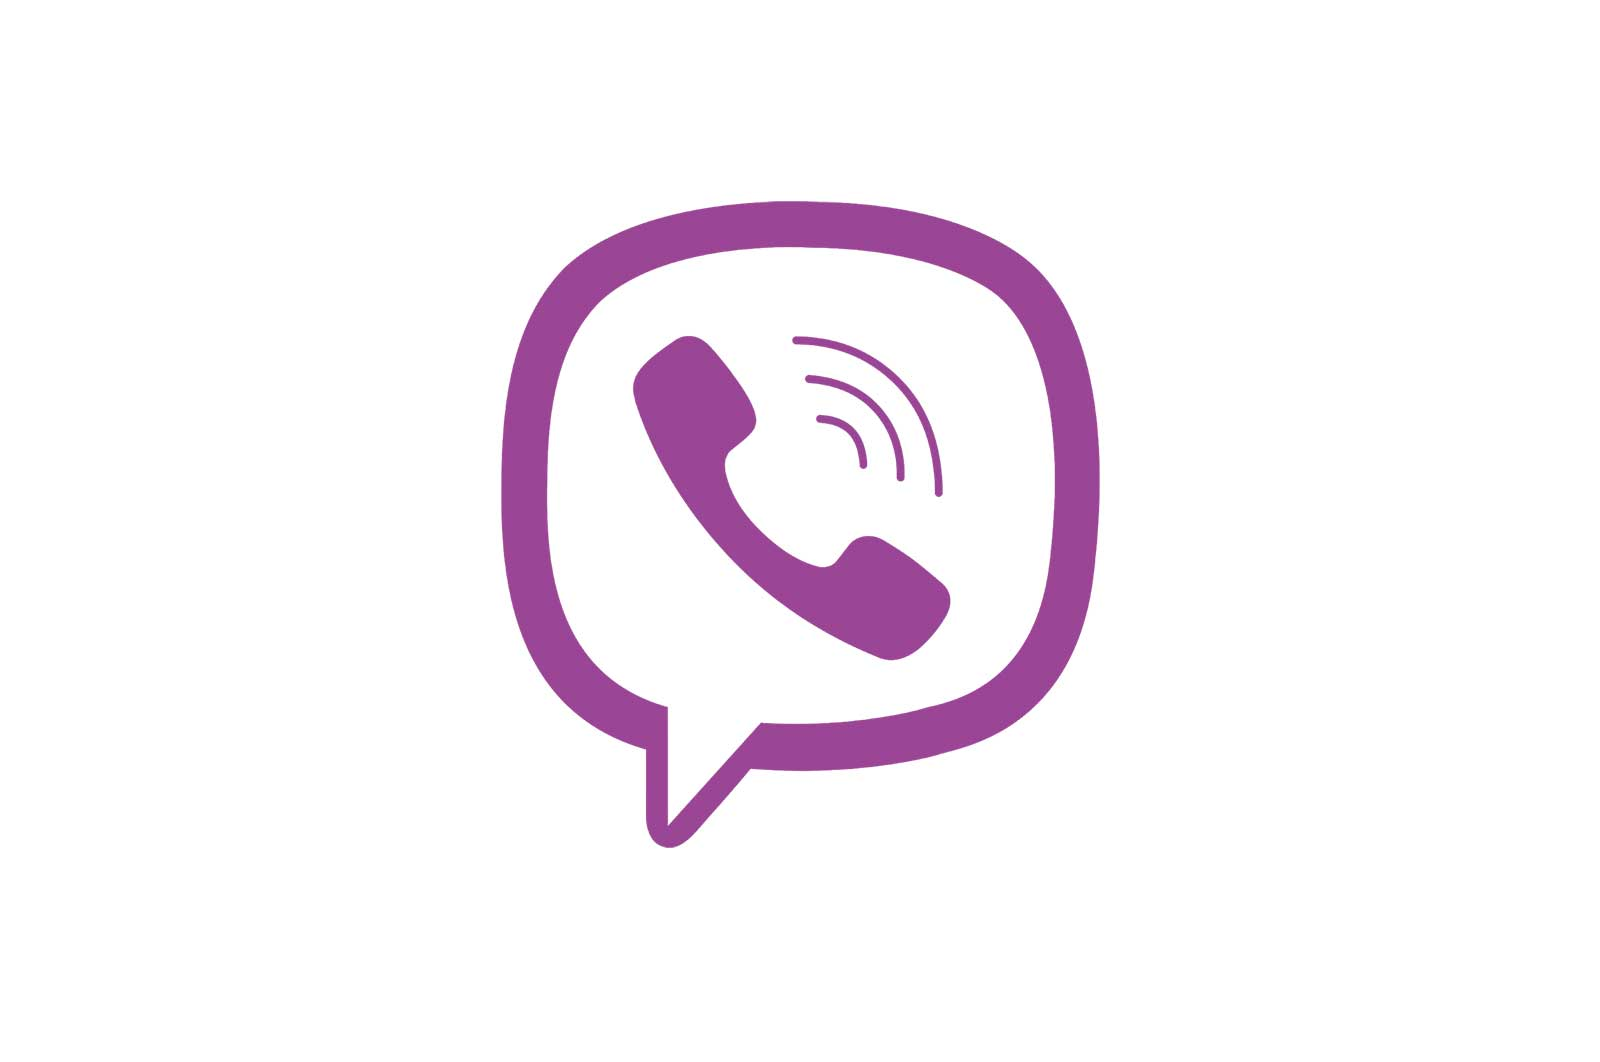 Ukončete tajné chaty na Viber Messenger